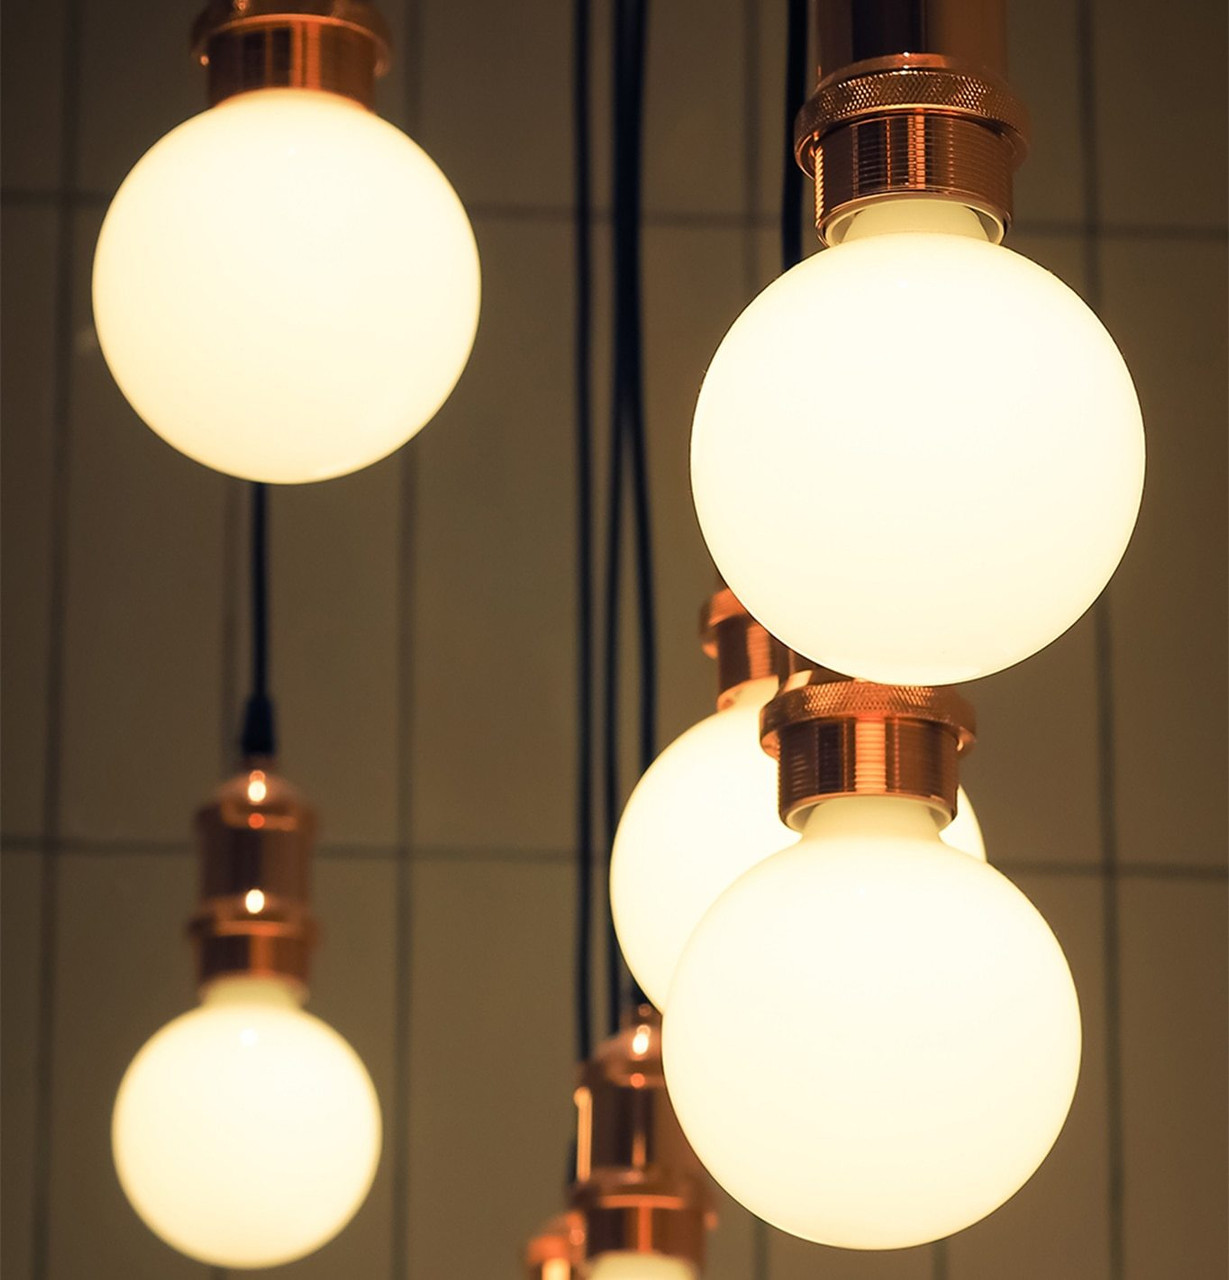 Crompton Lamps LED G125 E27 Light Bulbs